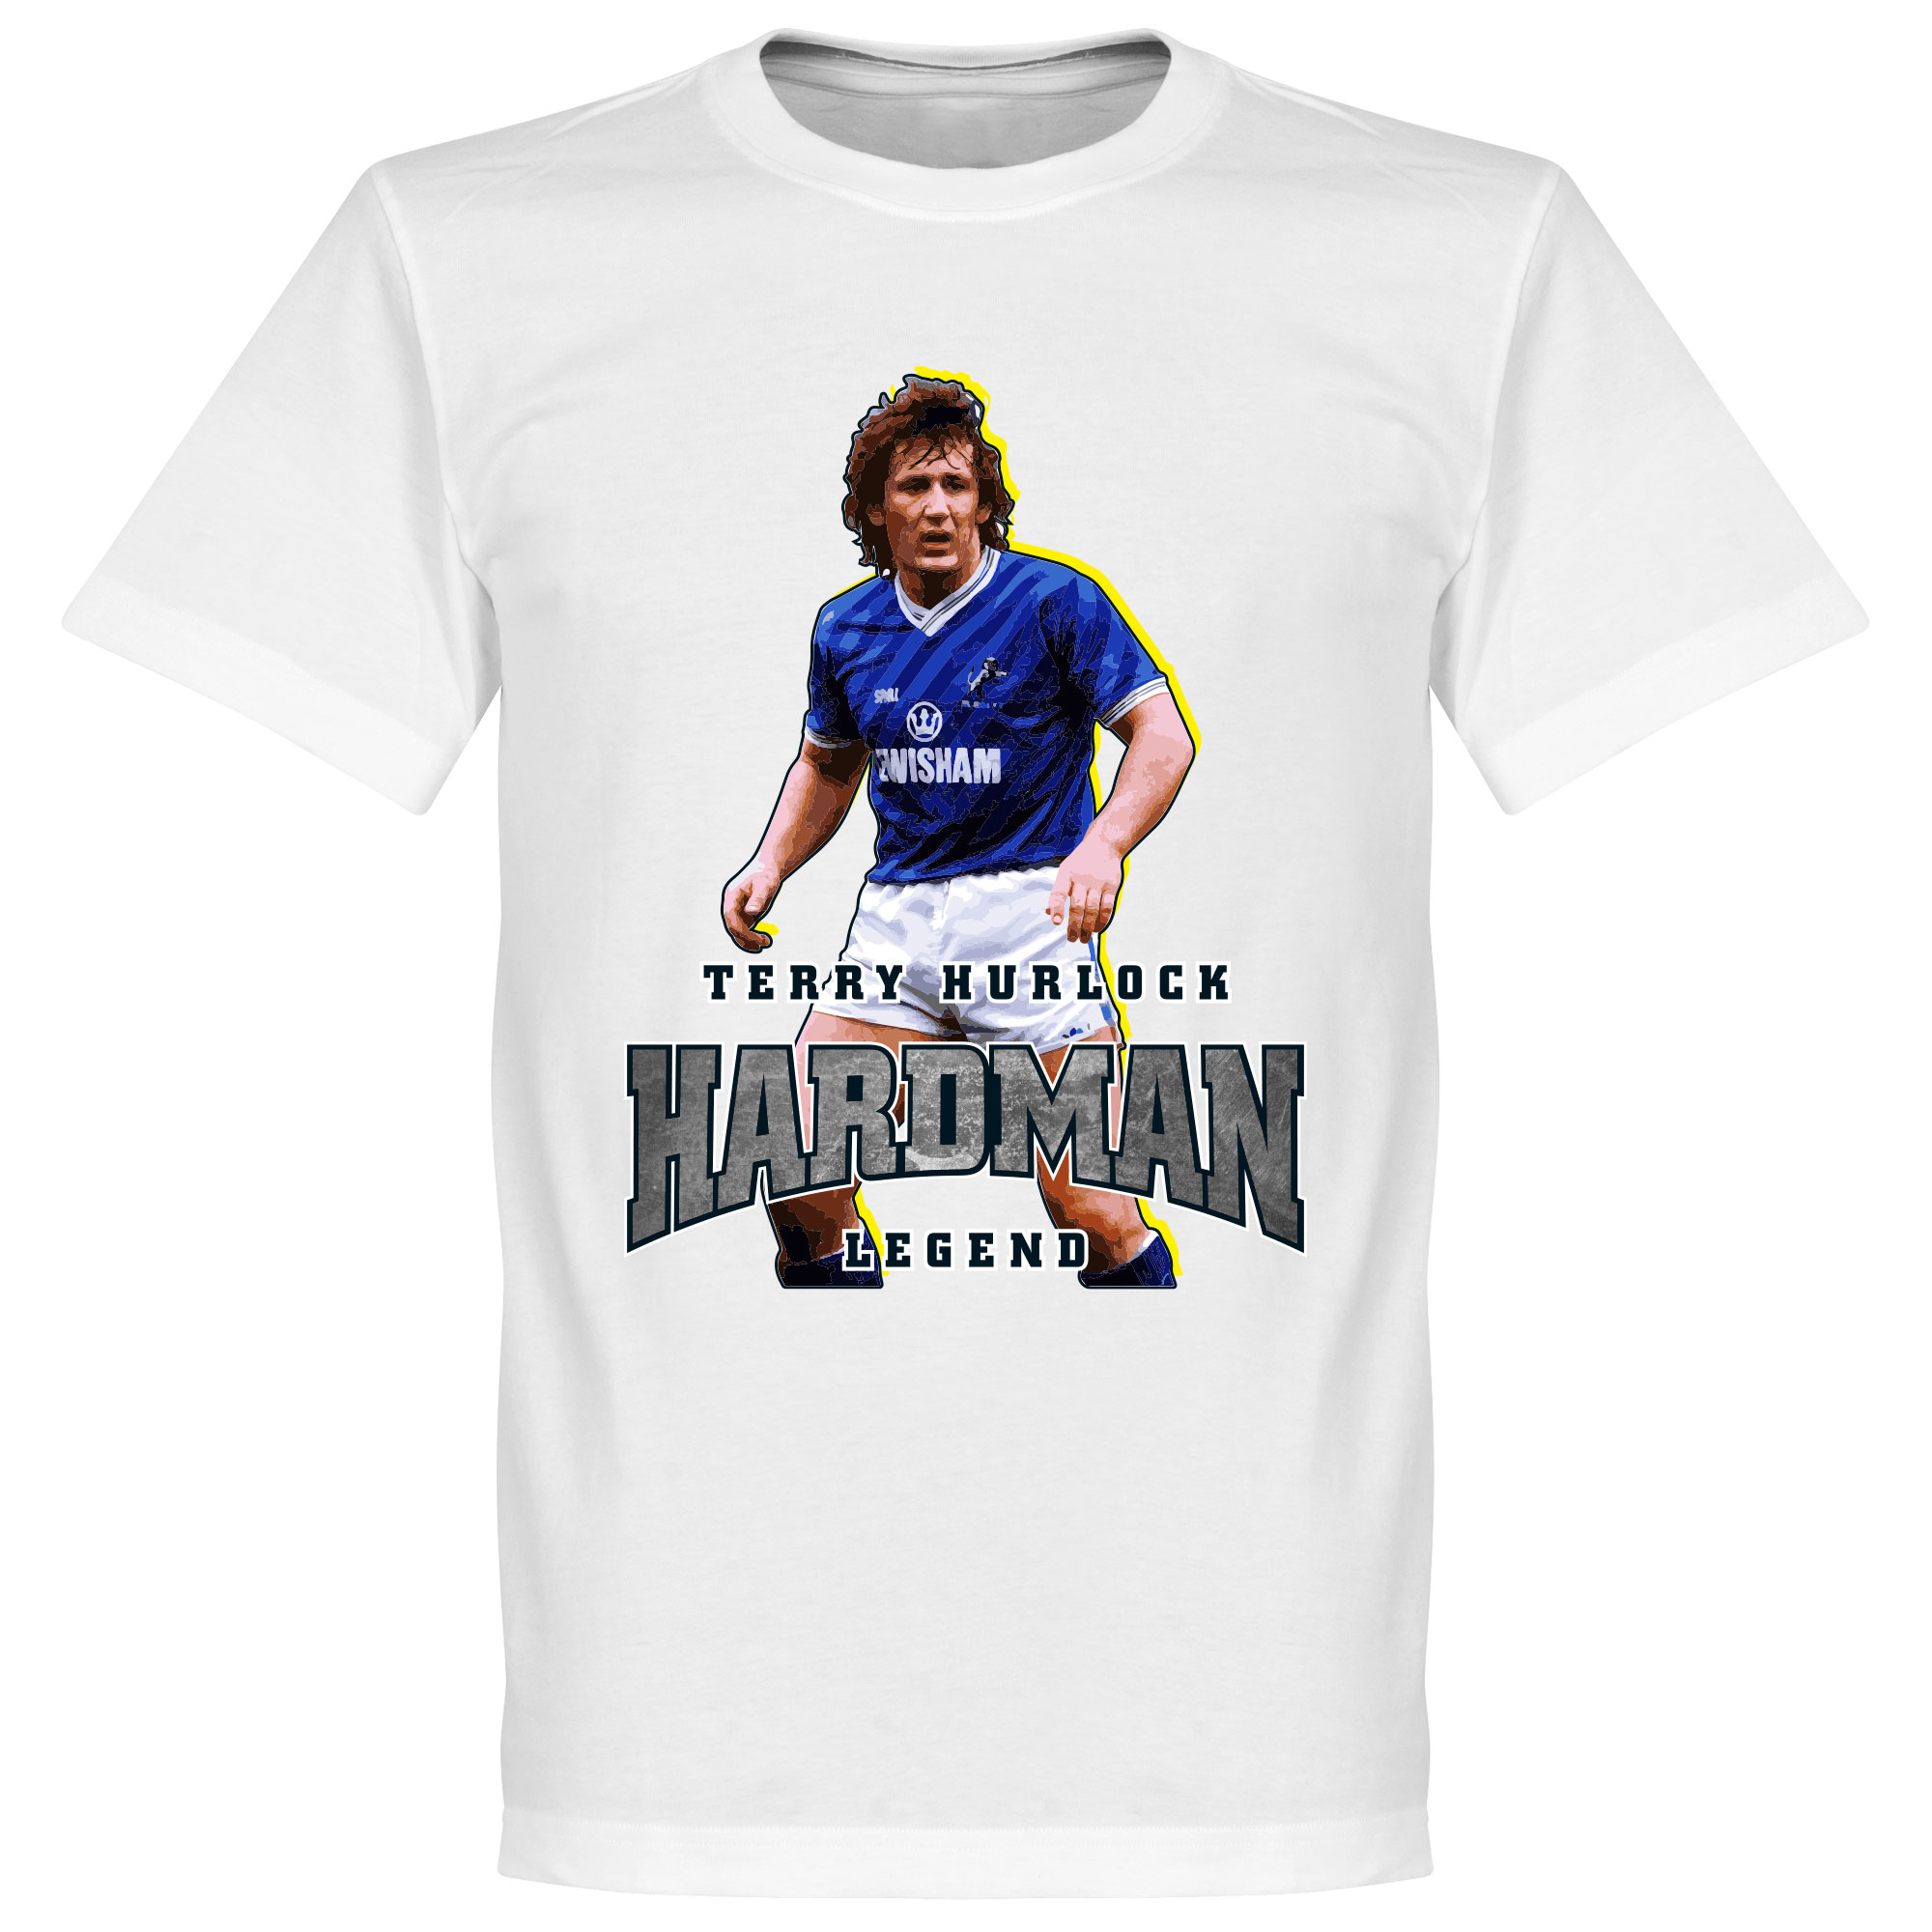 Terry Hurlock Hardman T-Shirt